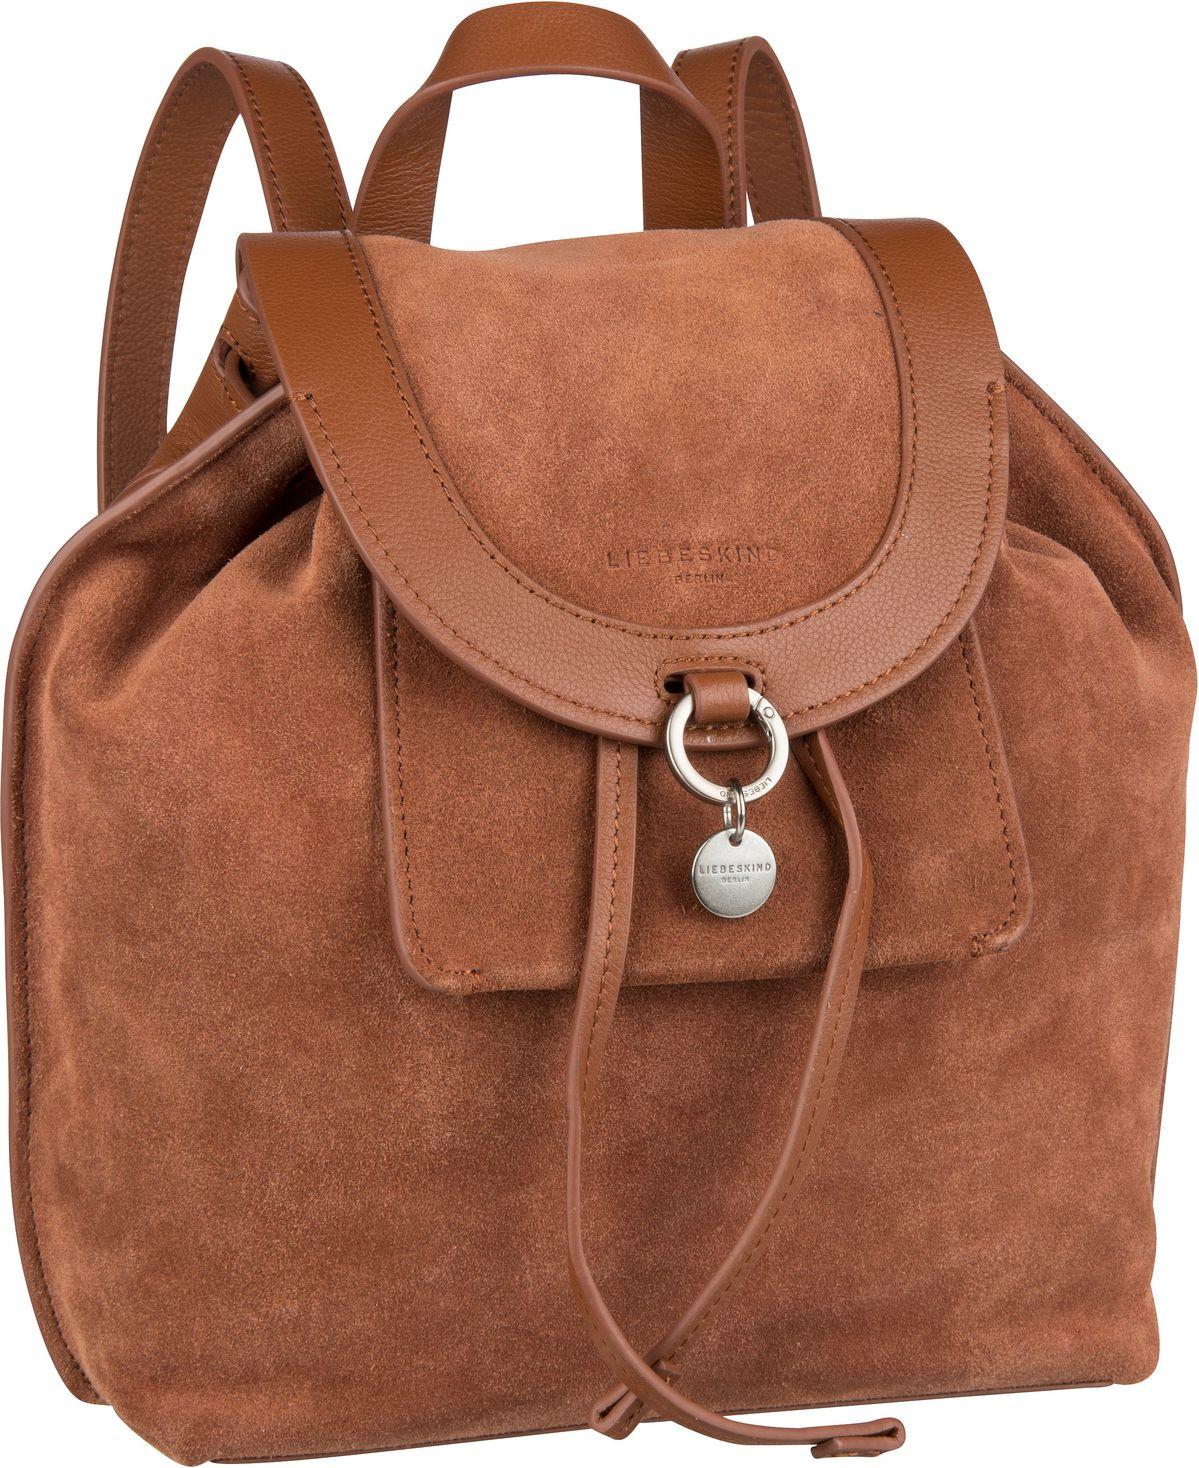 Berlin Rucksack / Daypack Scouri 2 Backpack M Bourbon